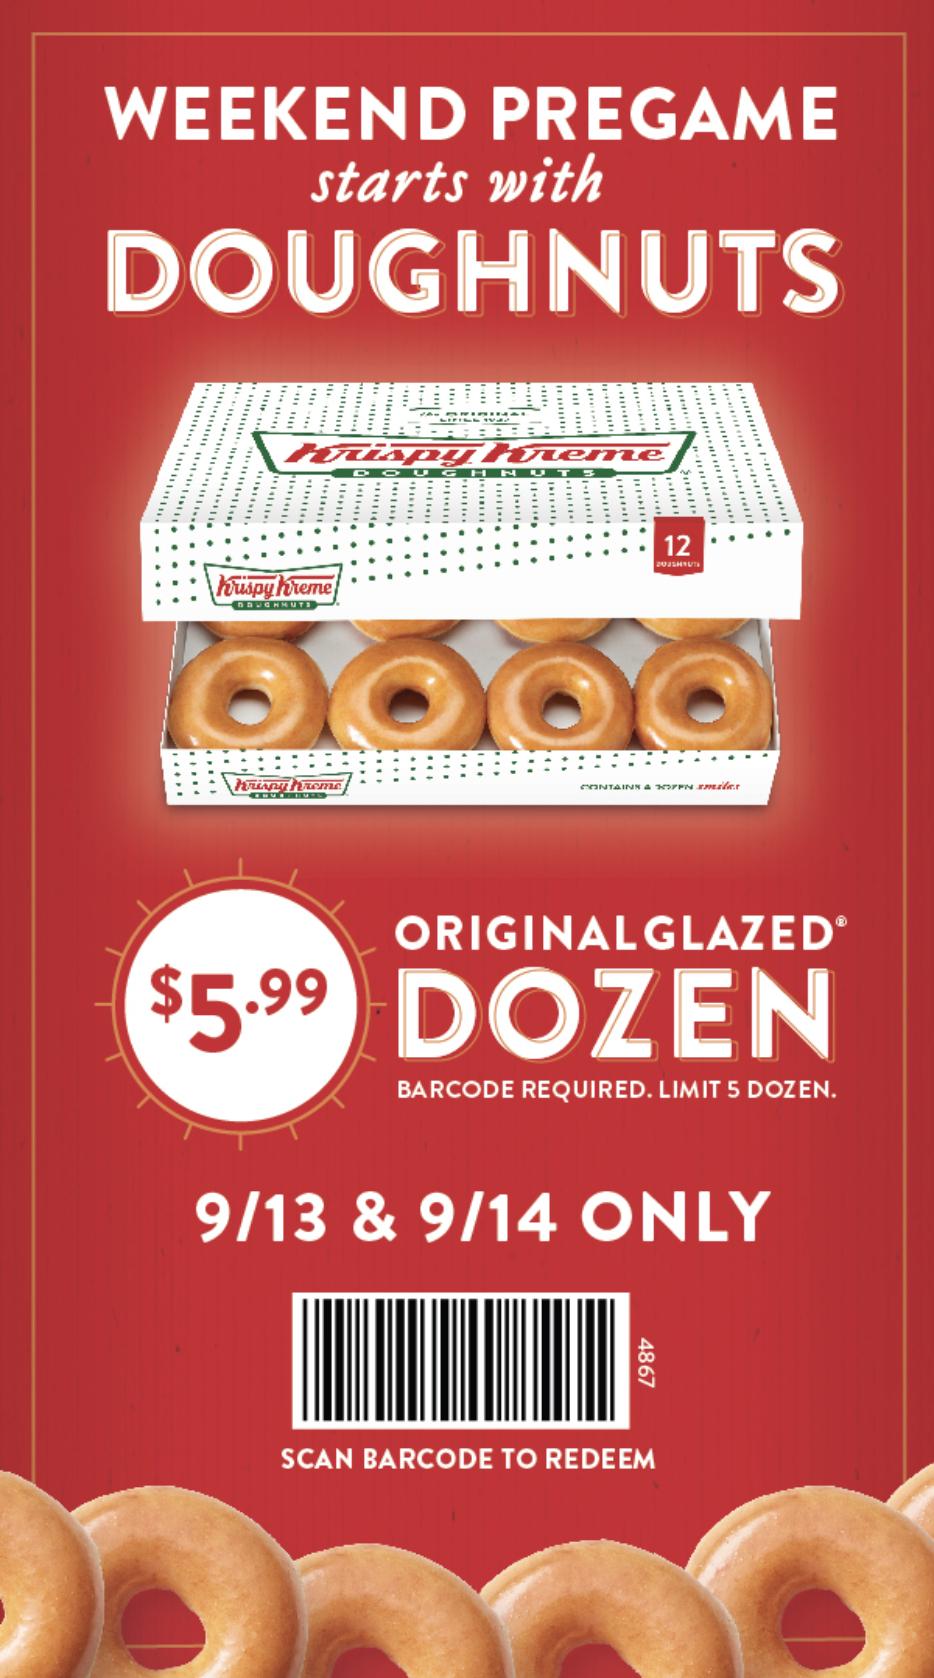 Krispy Kreme Is Offering 12 Donuts For $6 On 9/13 & 9/14 Only - Free Printable Krispy Kreme Coupons